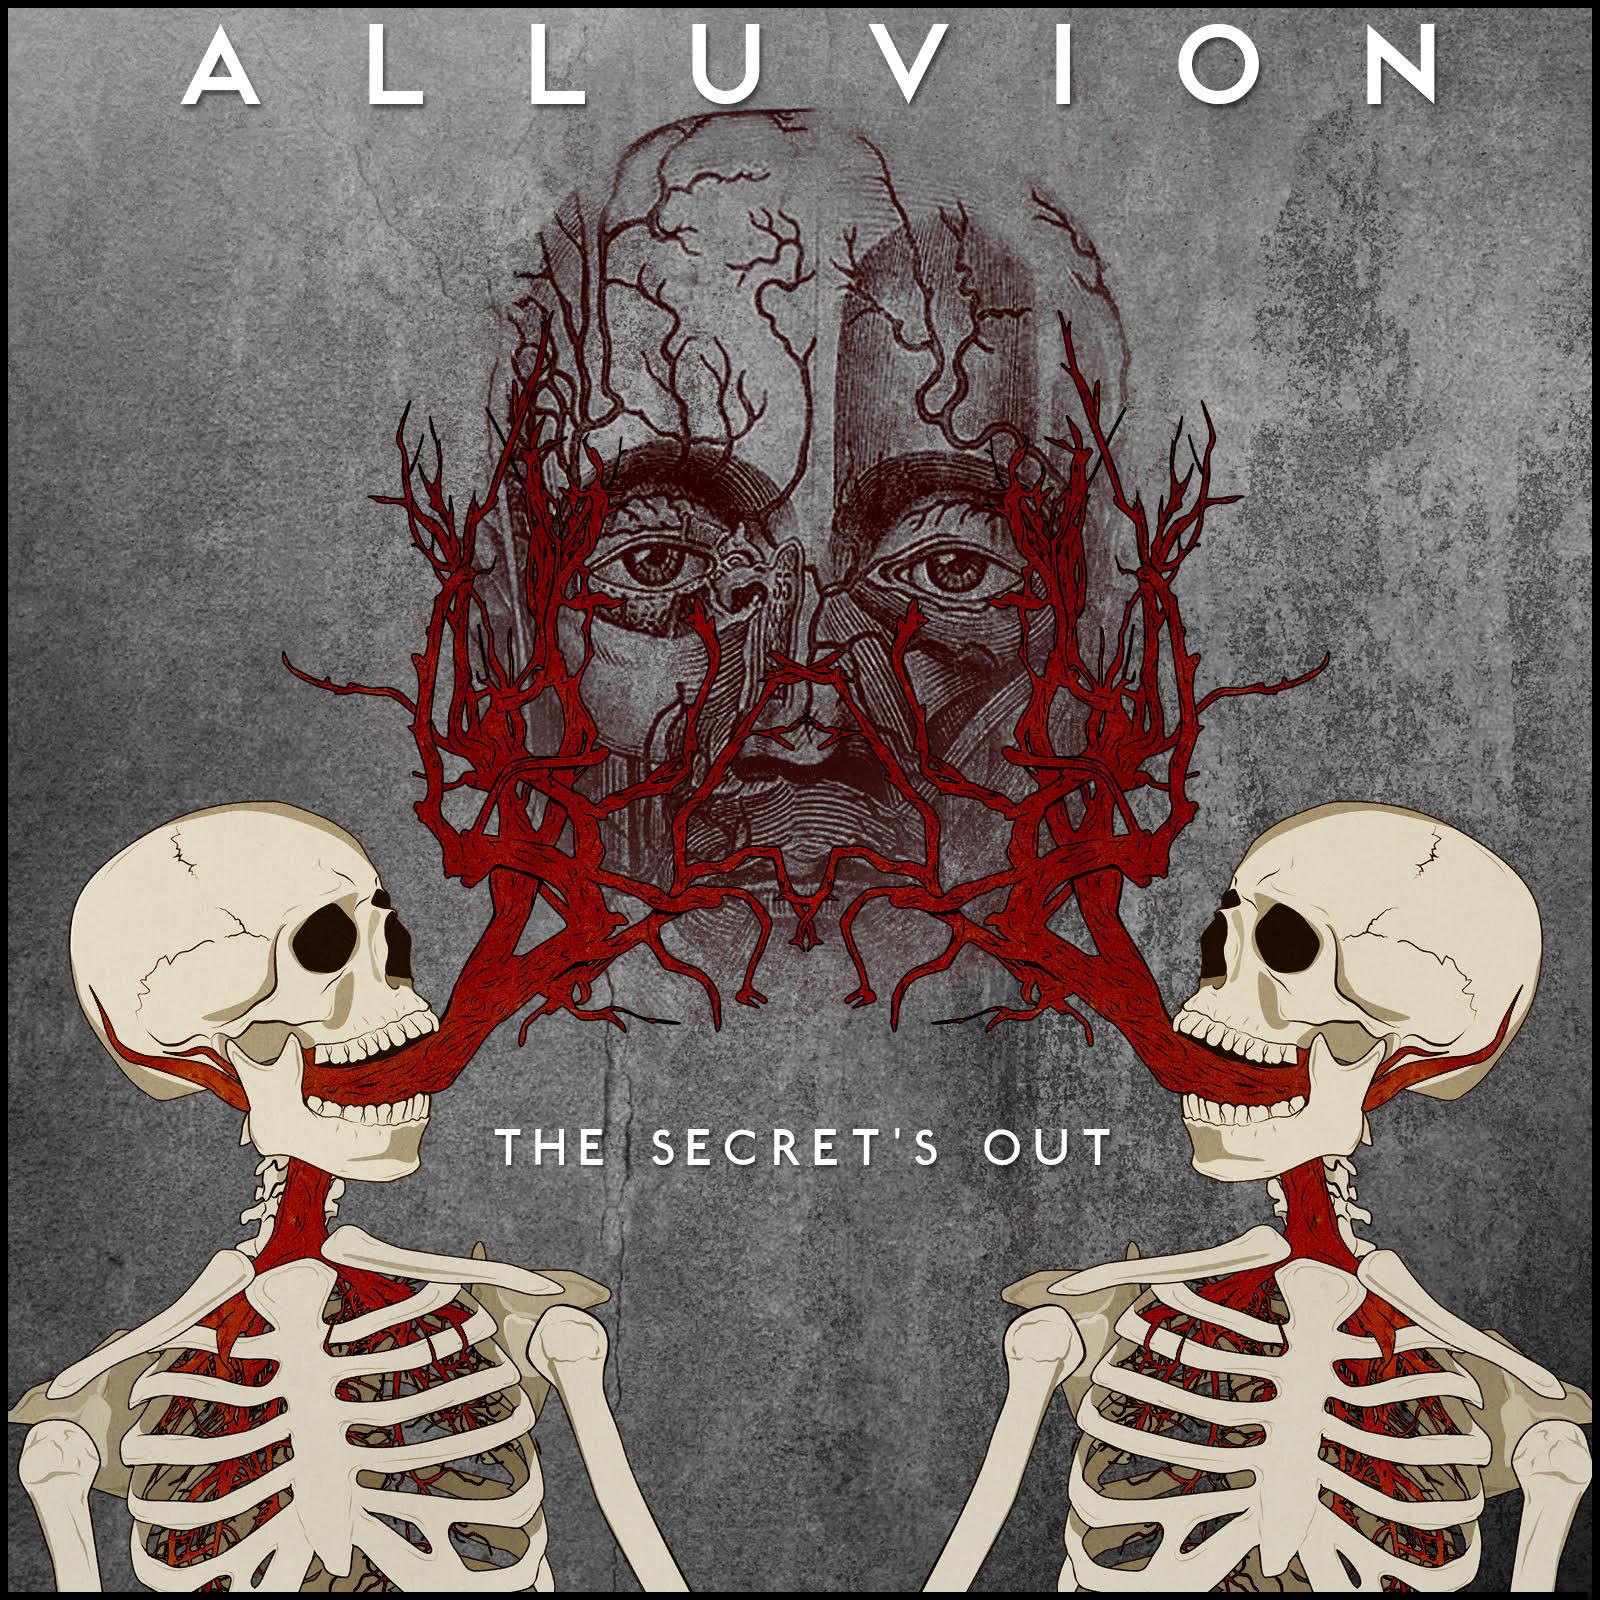 Alluvion The Secrets Out